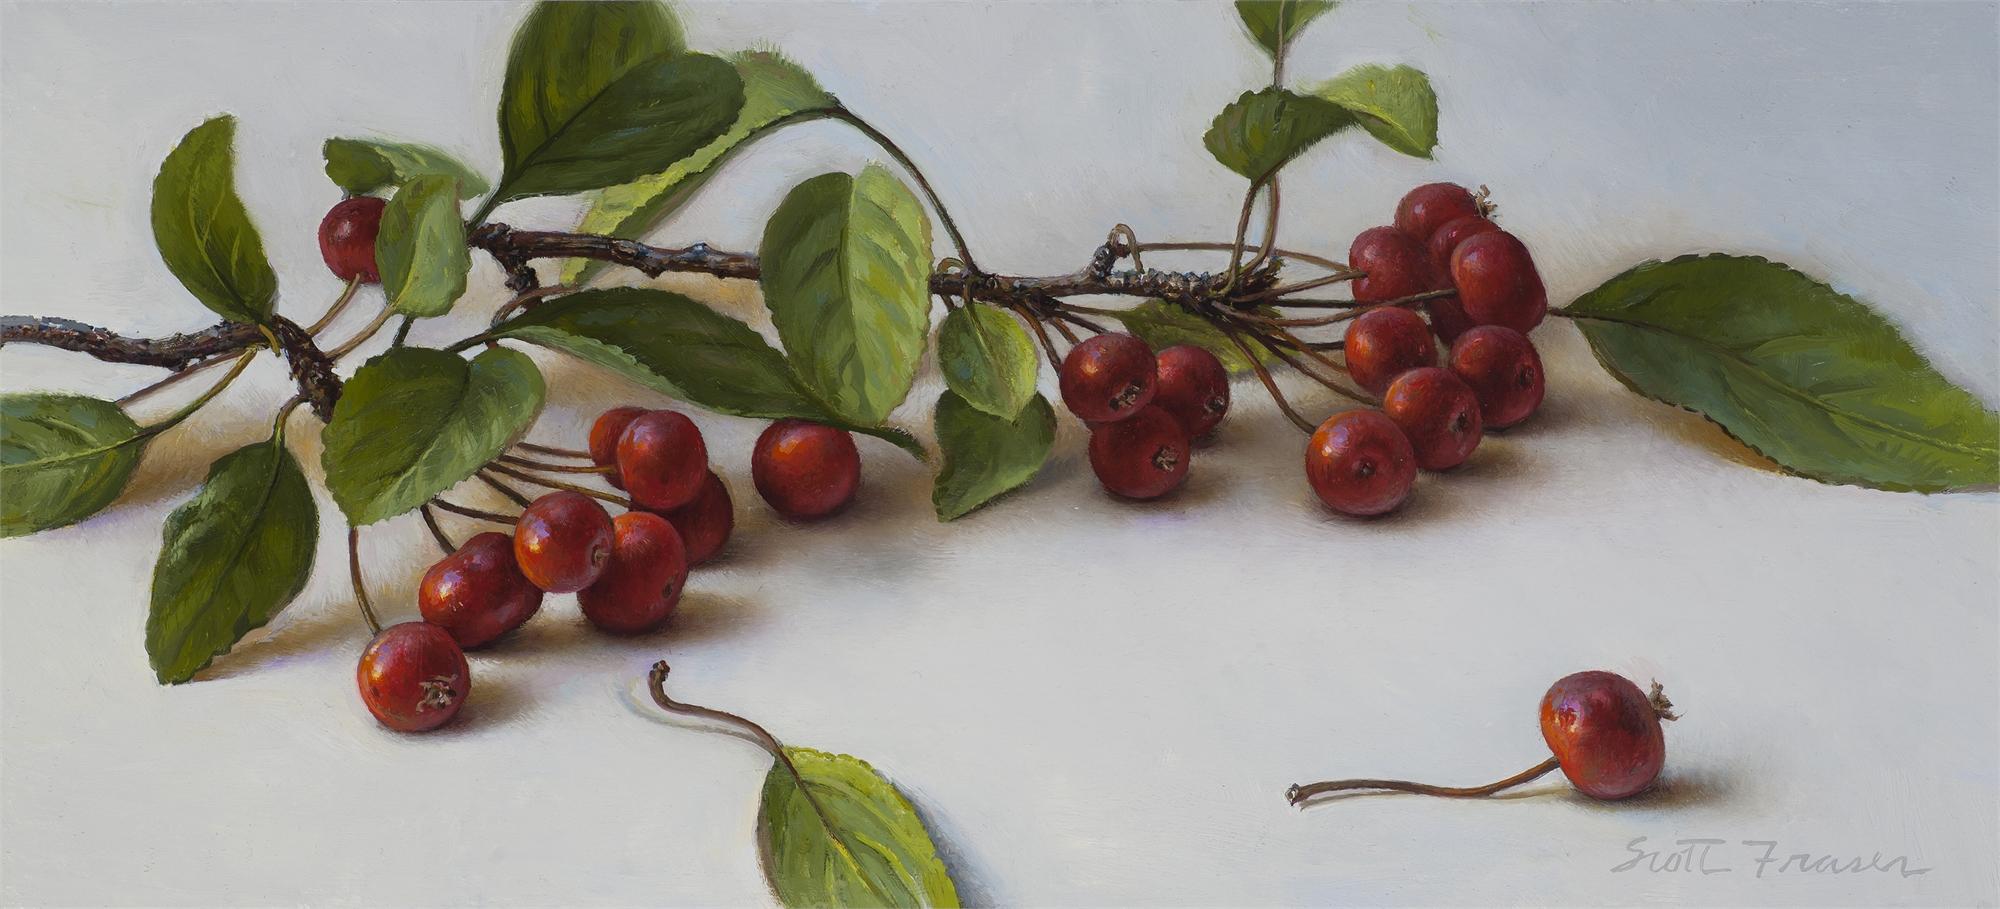 Red Crabapples by Scott Fraser